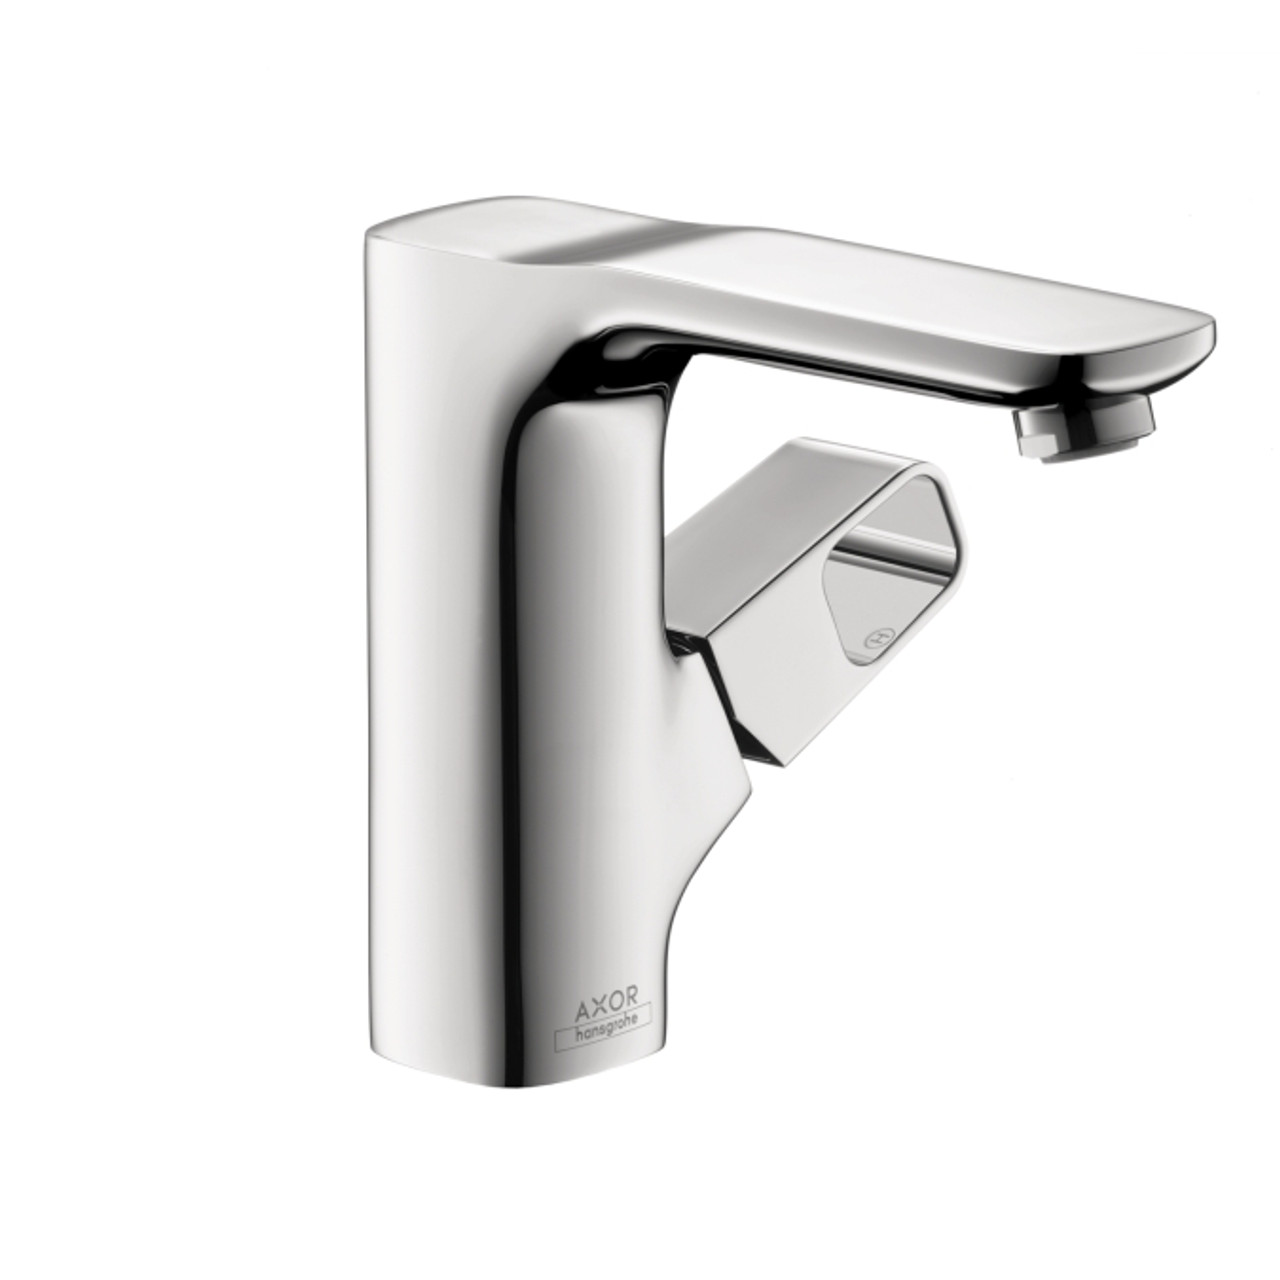 hansgrohe axor urquiola single hole faucet